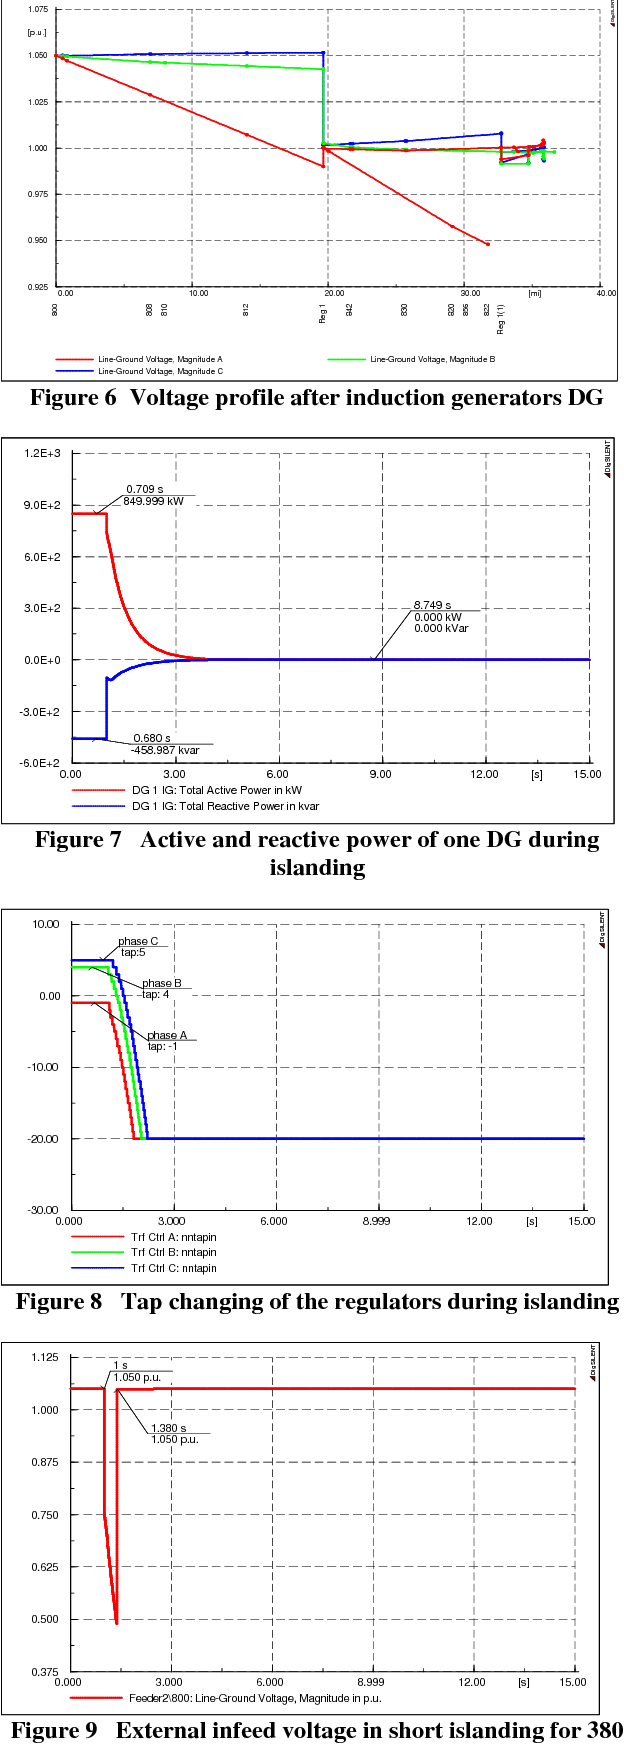 Figure 8 Tap changing of the regulators during islanding